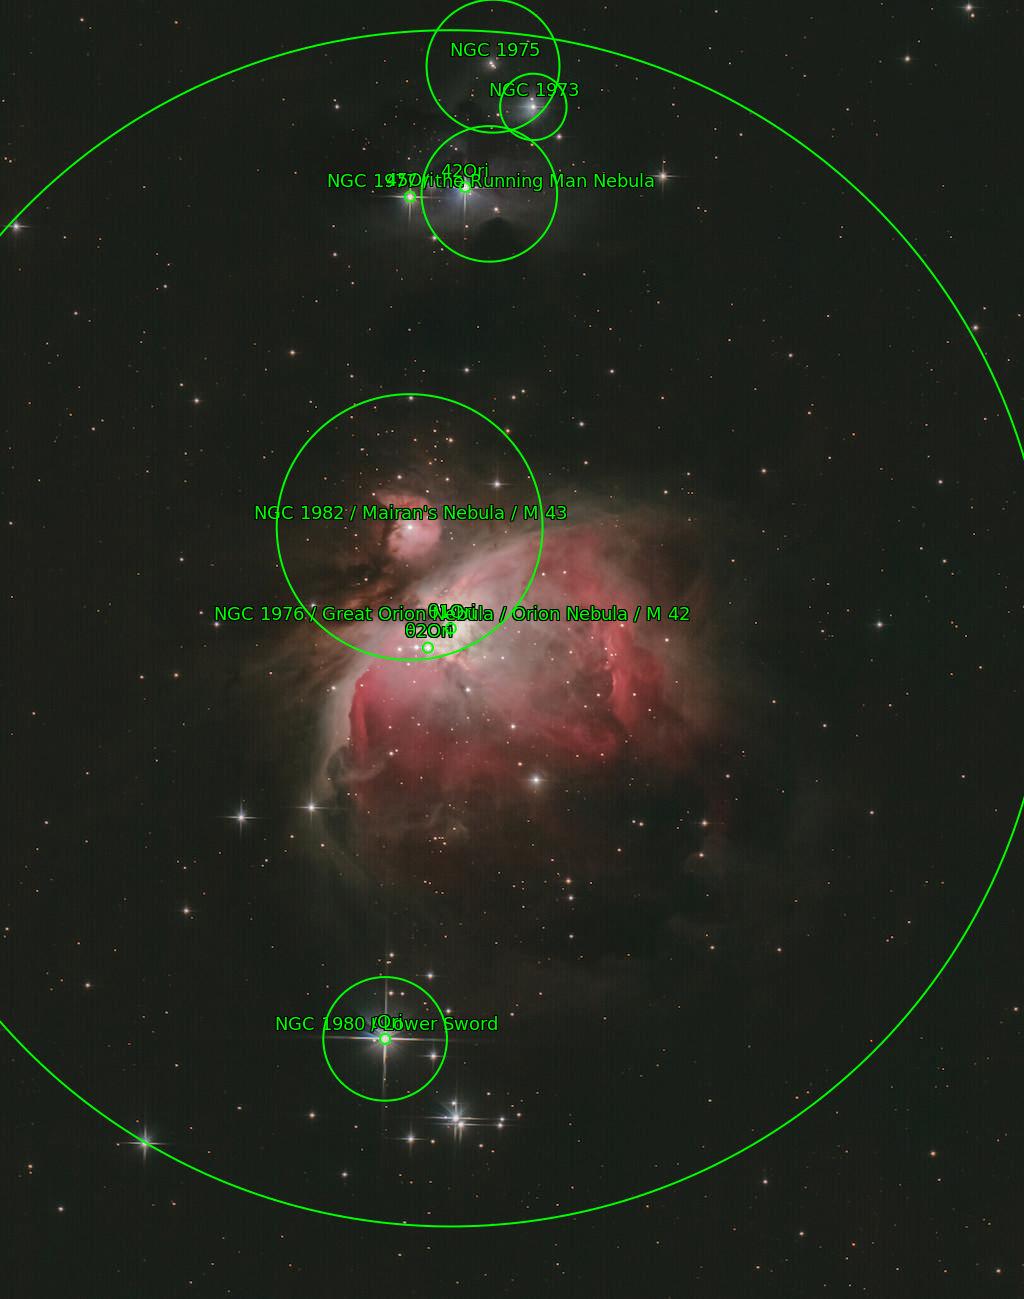 M42 - Orion nebula (astrometry results)